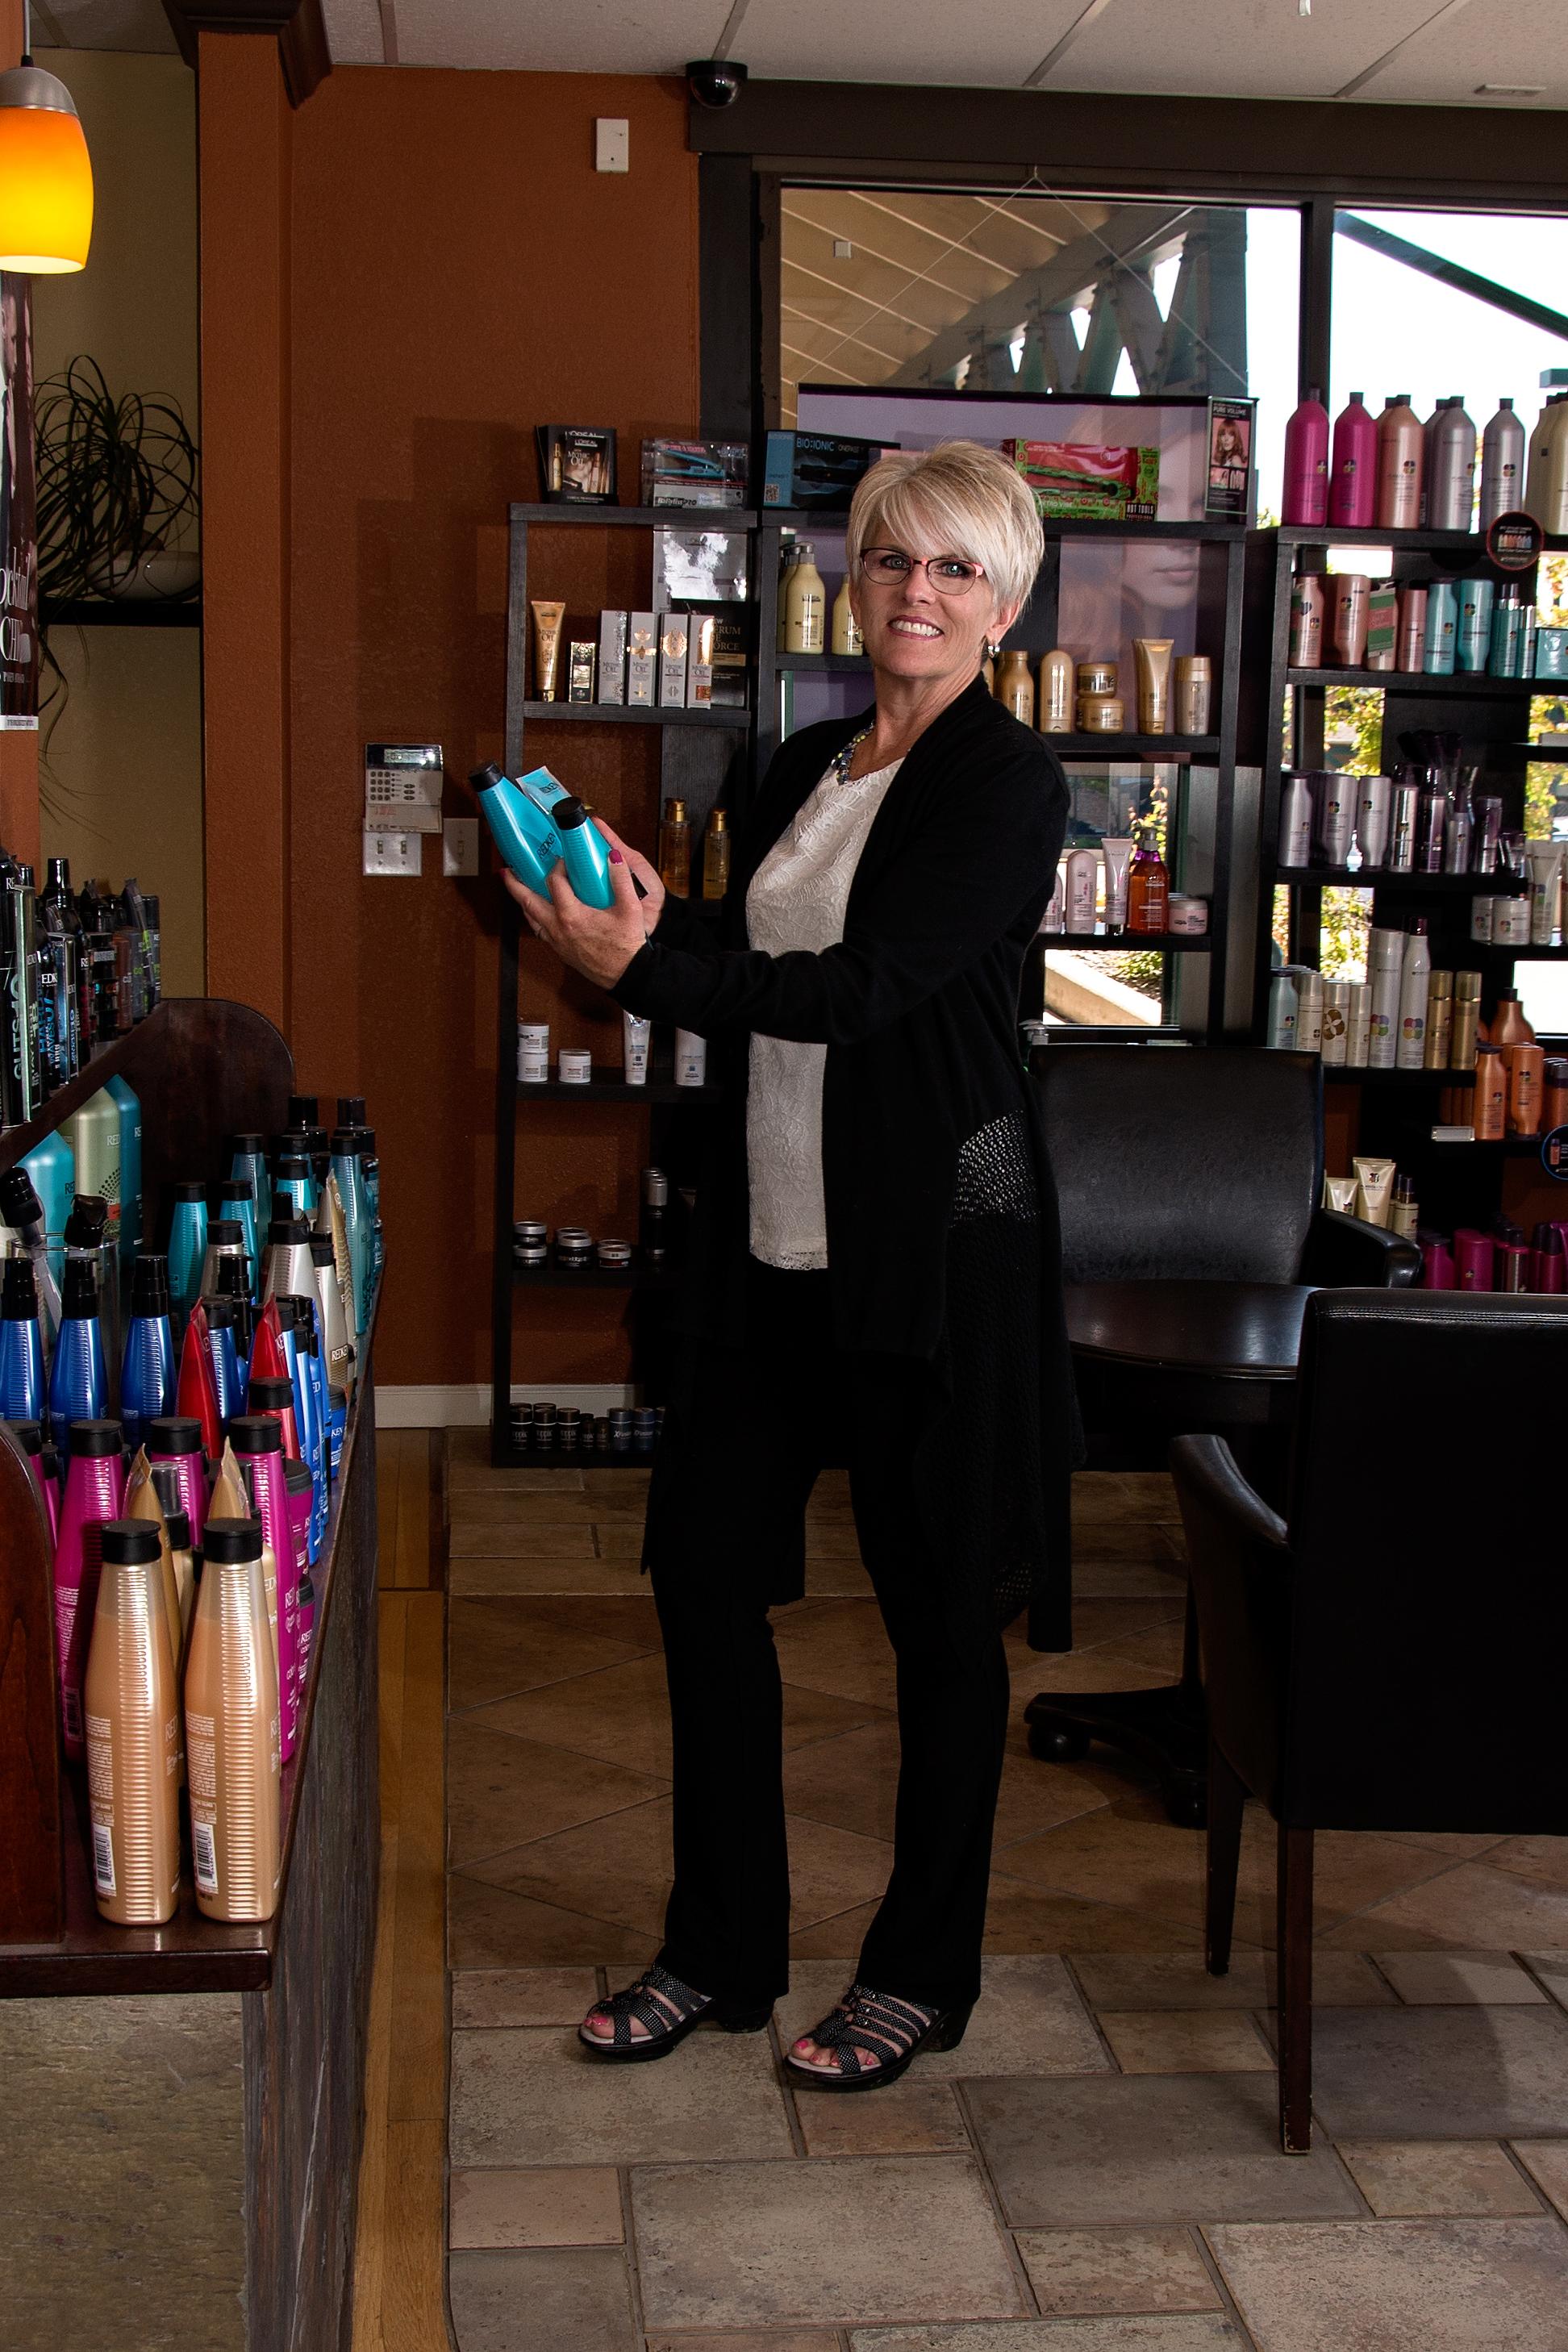 Cheri Frank - Hair Stylist at Salon Nevaeh in Littleton, CO